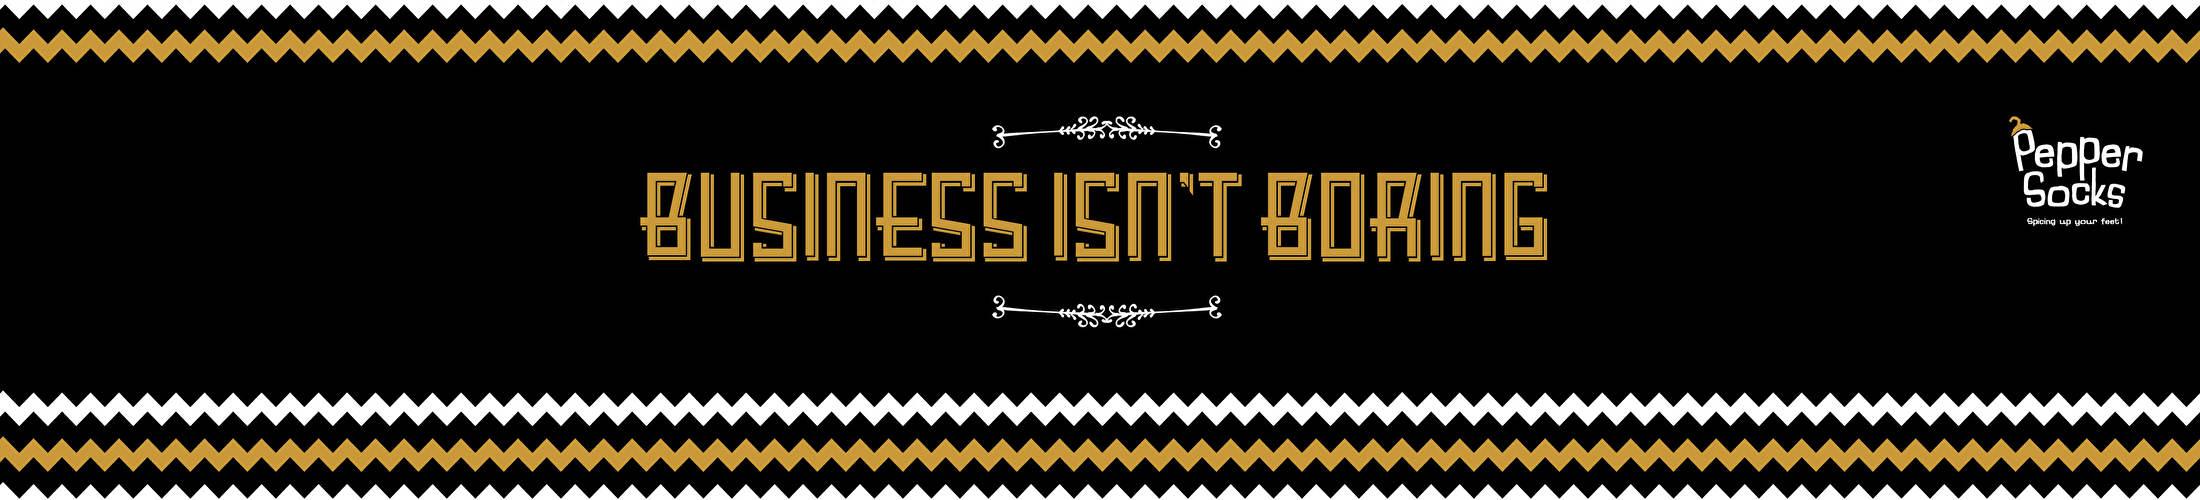 Business isn't boring